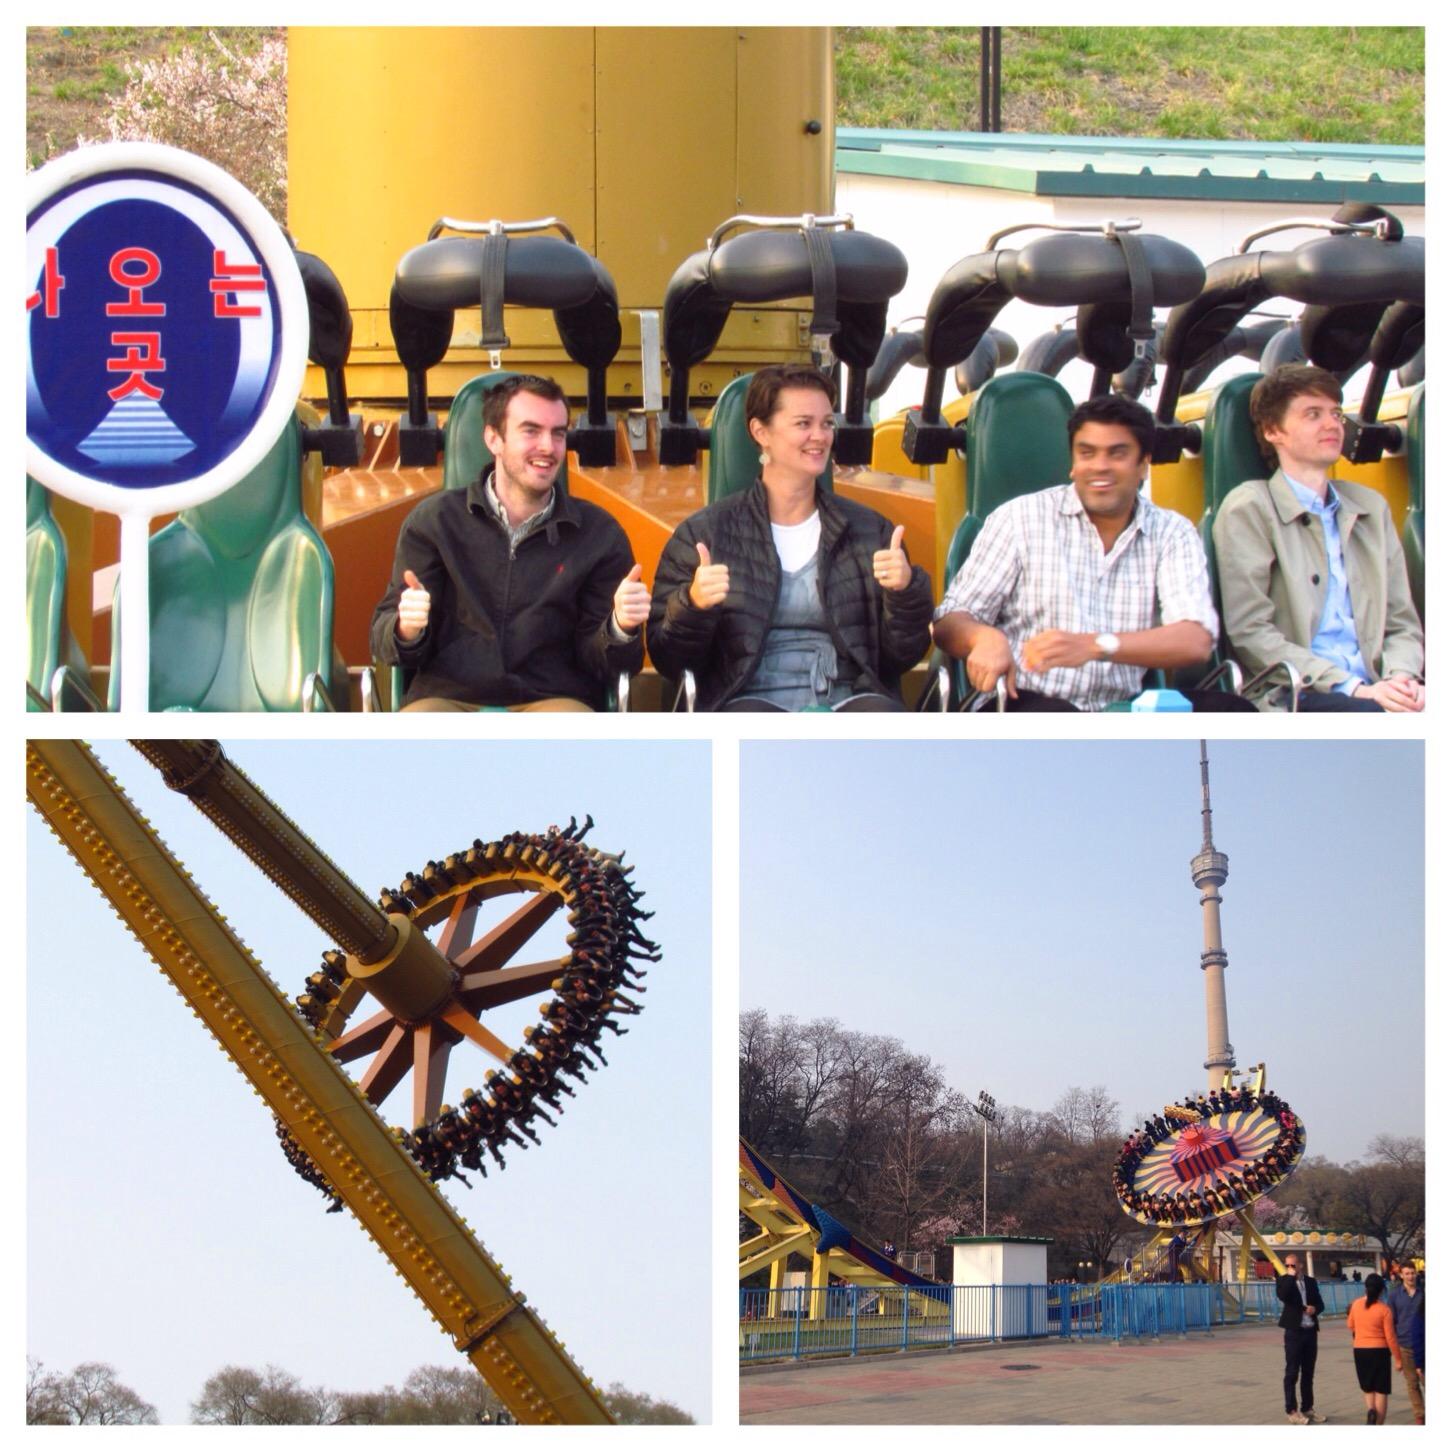 Caeson Fun Park